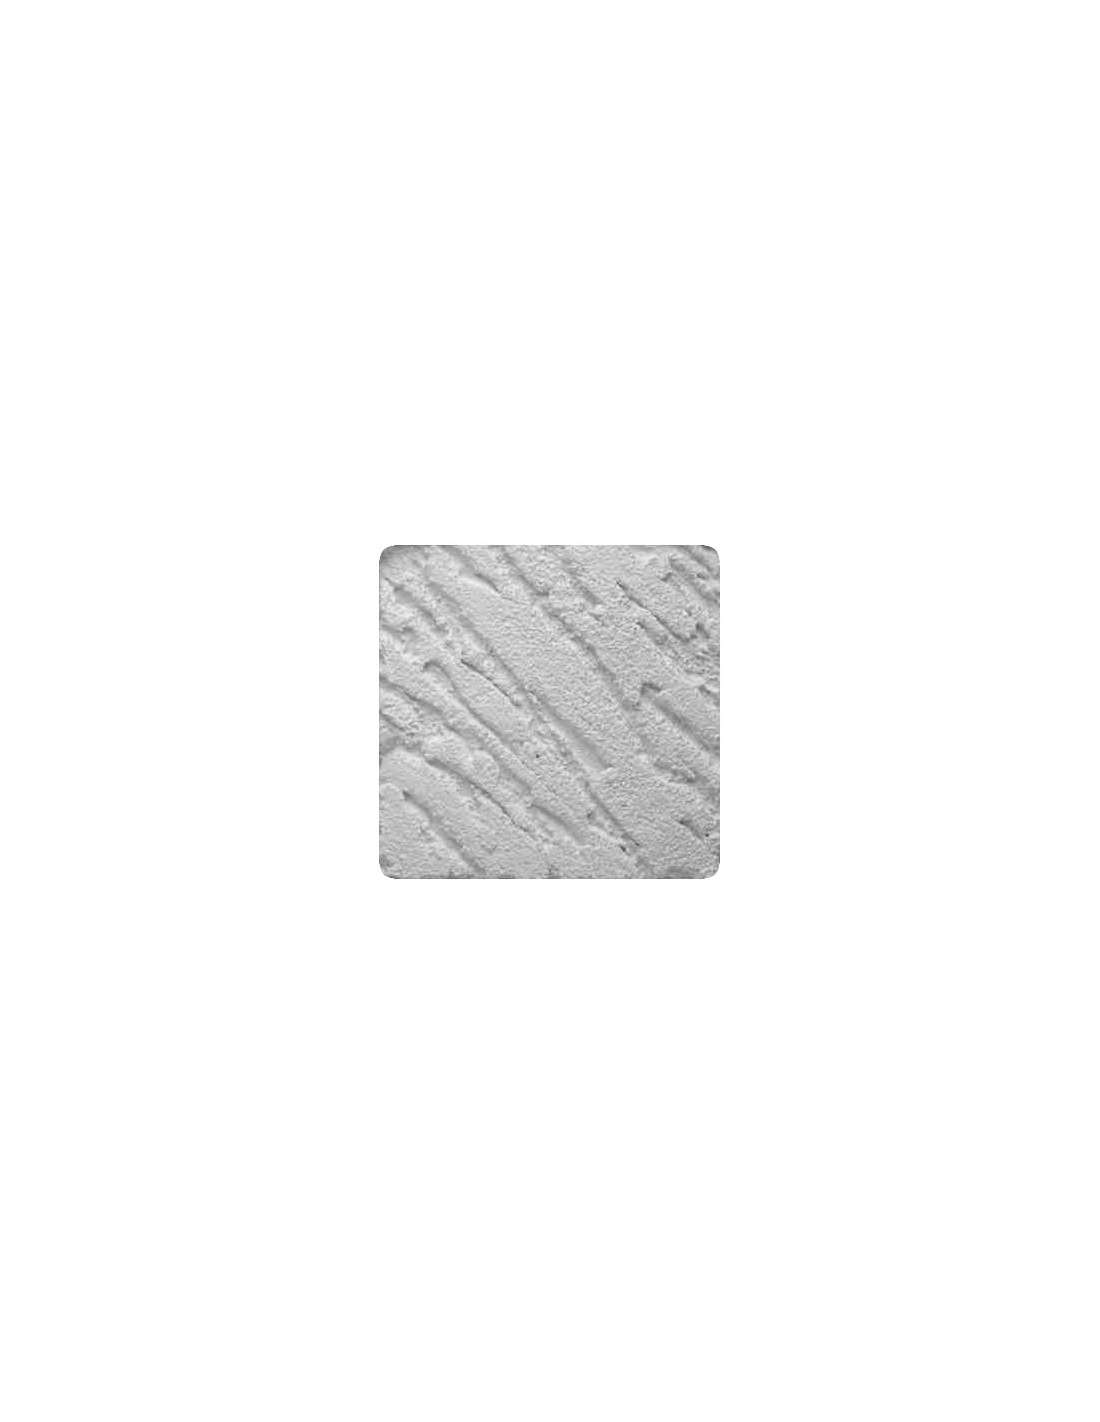 Ceresit Ct 35 Mineral Plaster Rustic Texture Abc